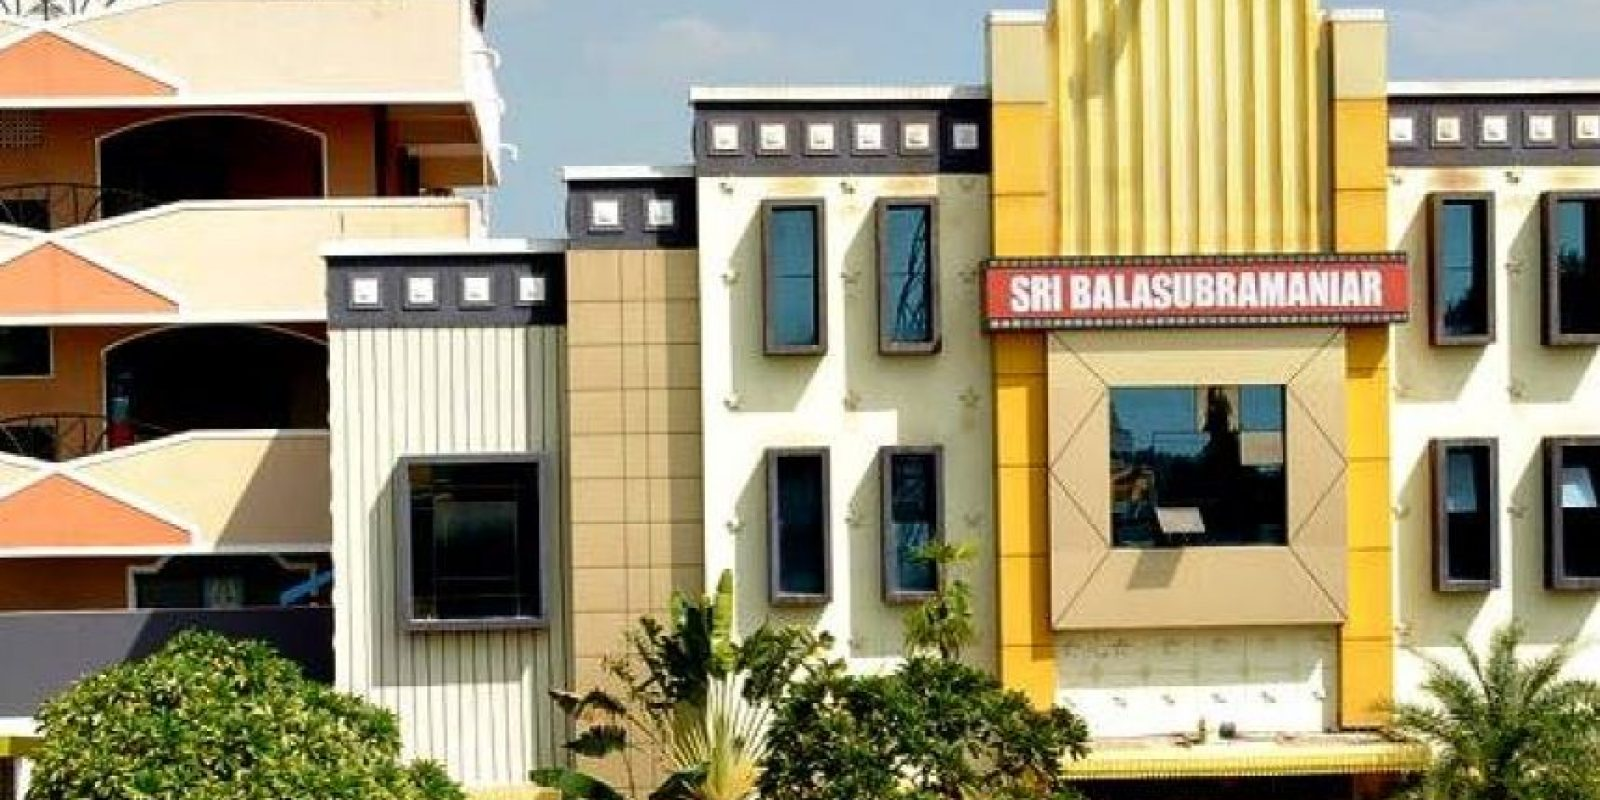 Fachada del cine Sri Balasubramaniar Foto:Facebook Sri Balasubramaniar Cinemas. Imagen Por: